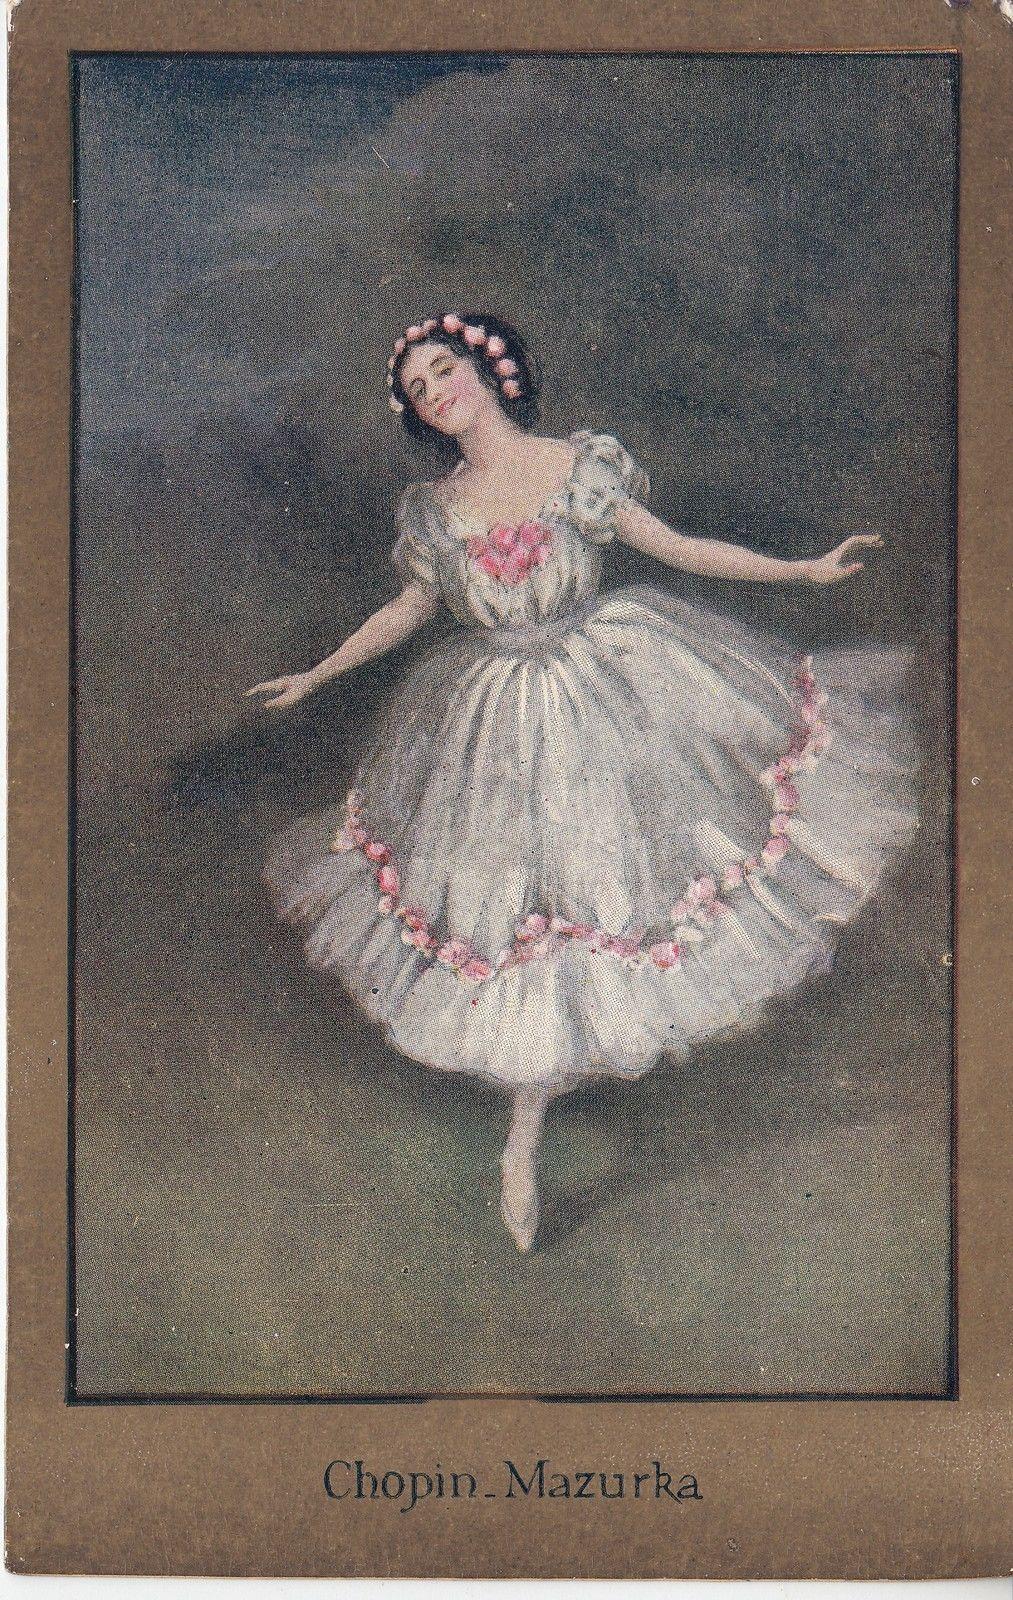 Sybil Barham: Chopin Mazurka. Memories of Pavlova Series - Ballet